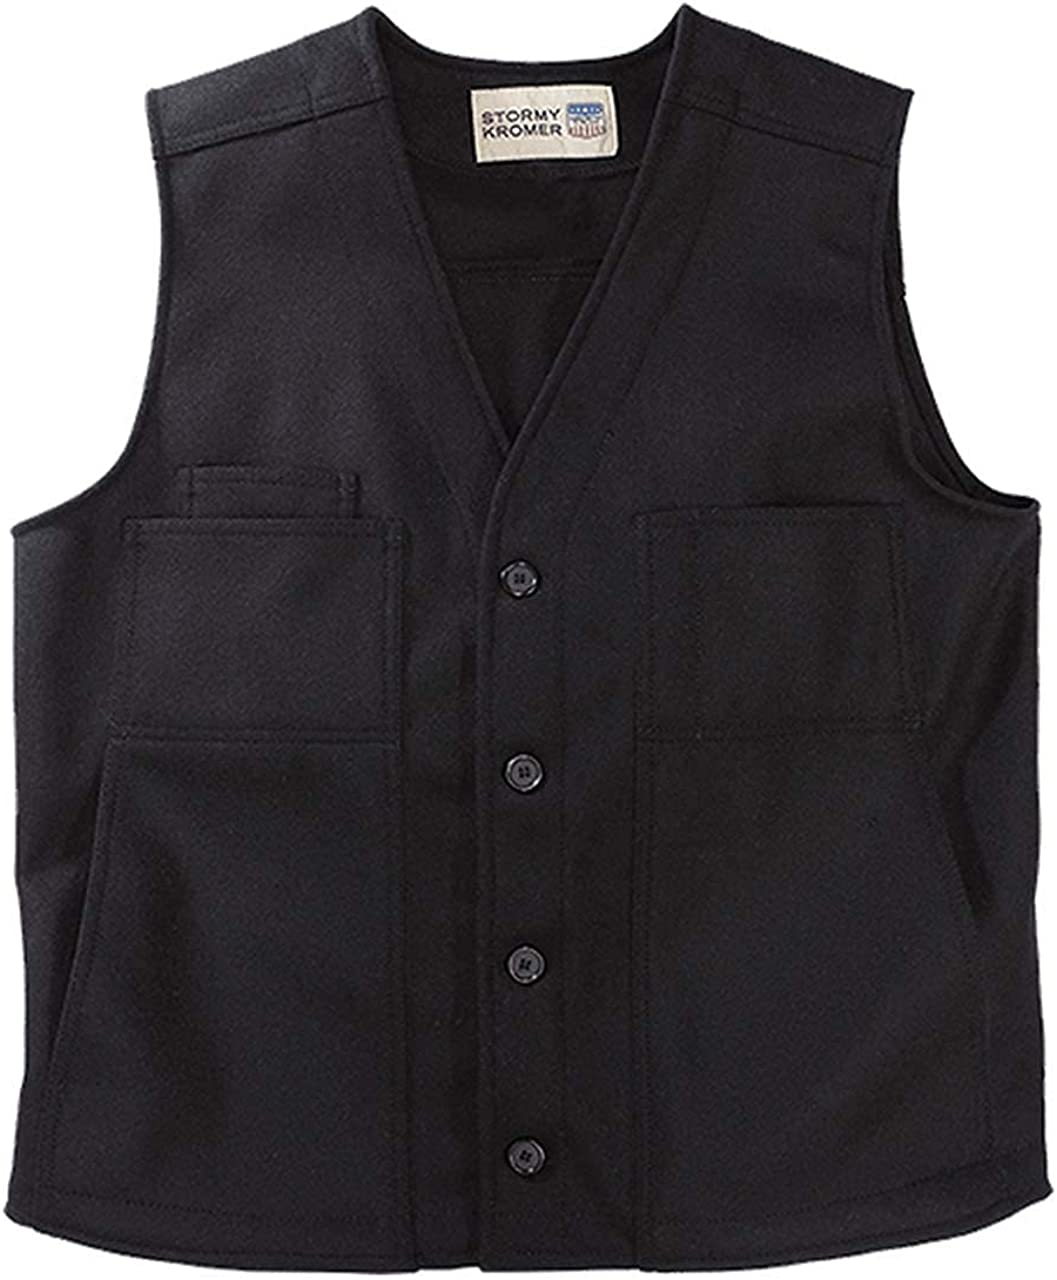 Stormy Kromer Button Vest - Cold Weather Men's Wool Vest